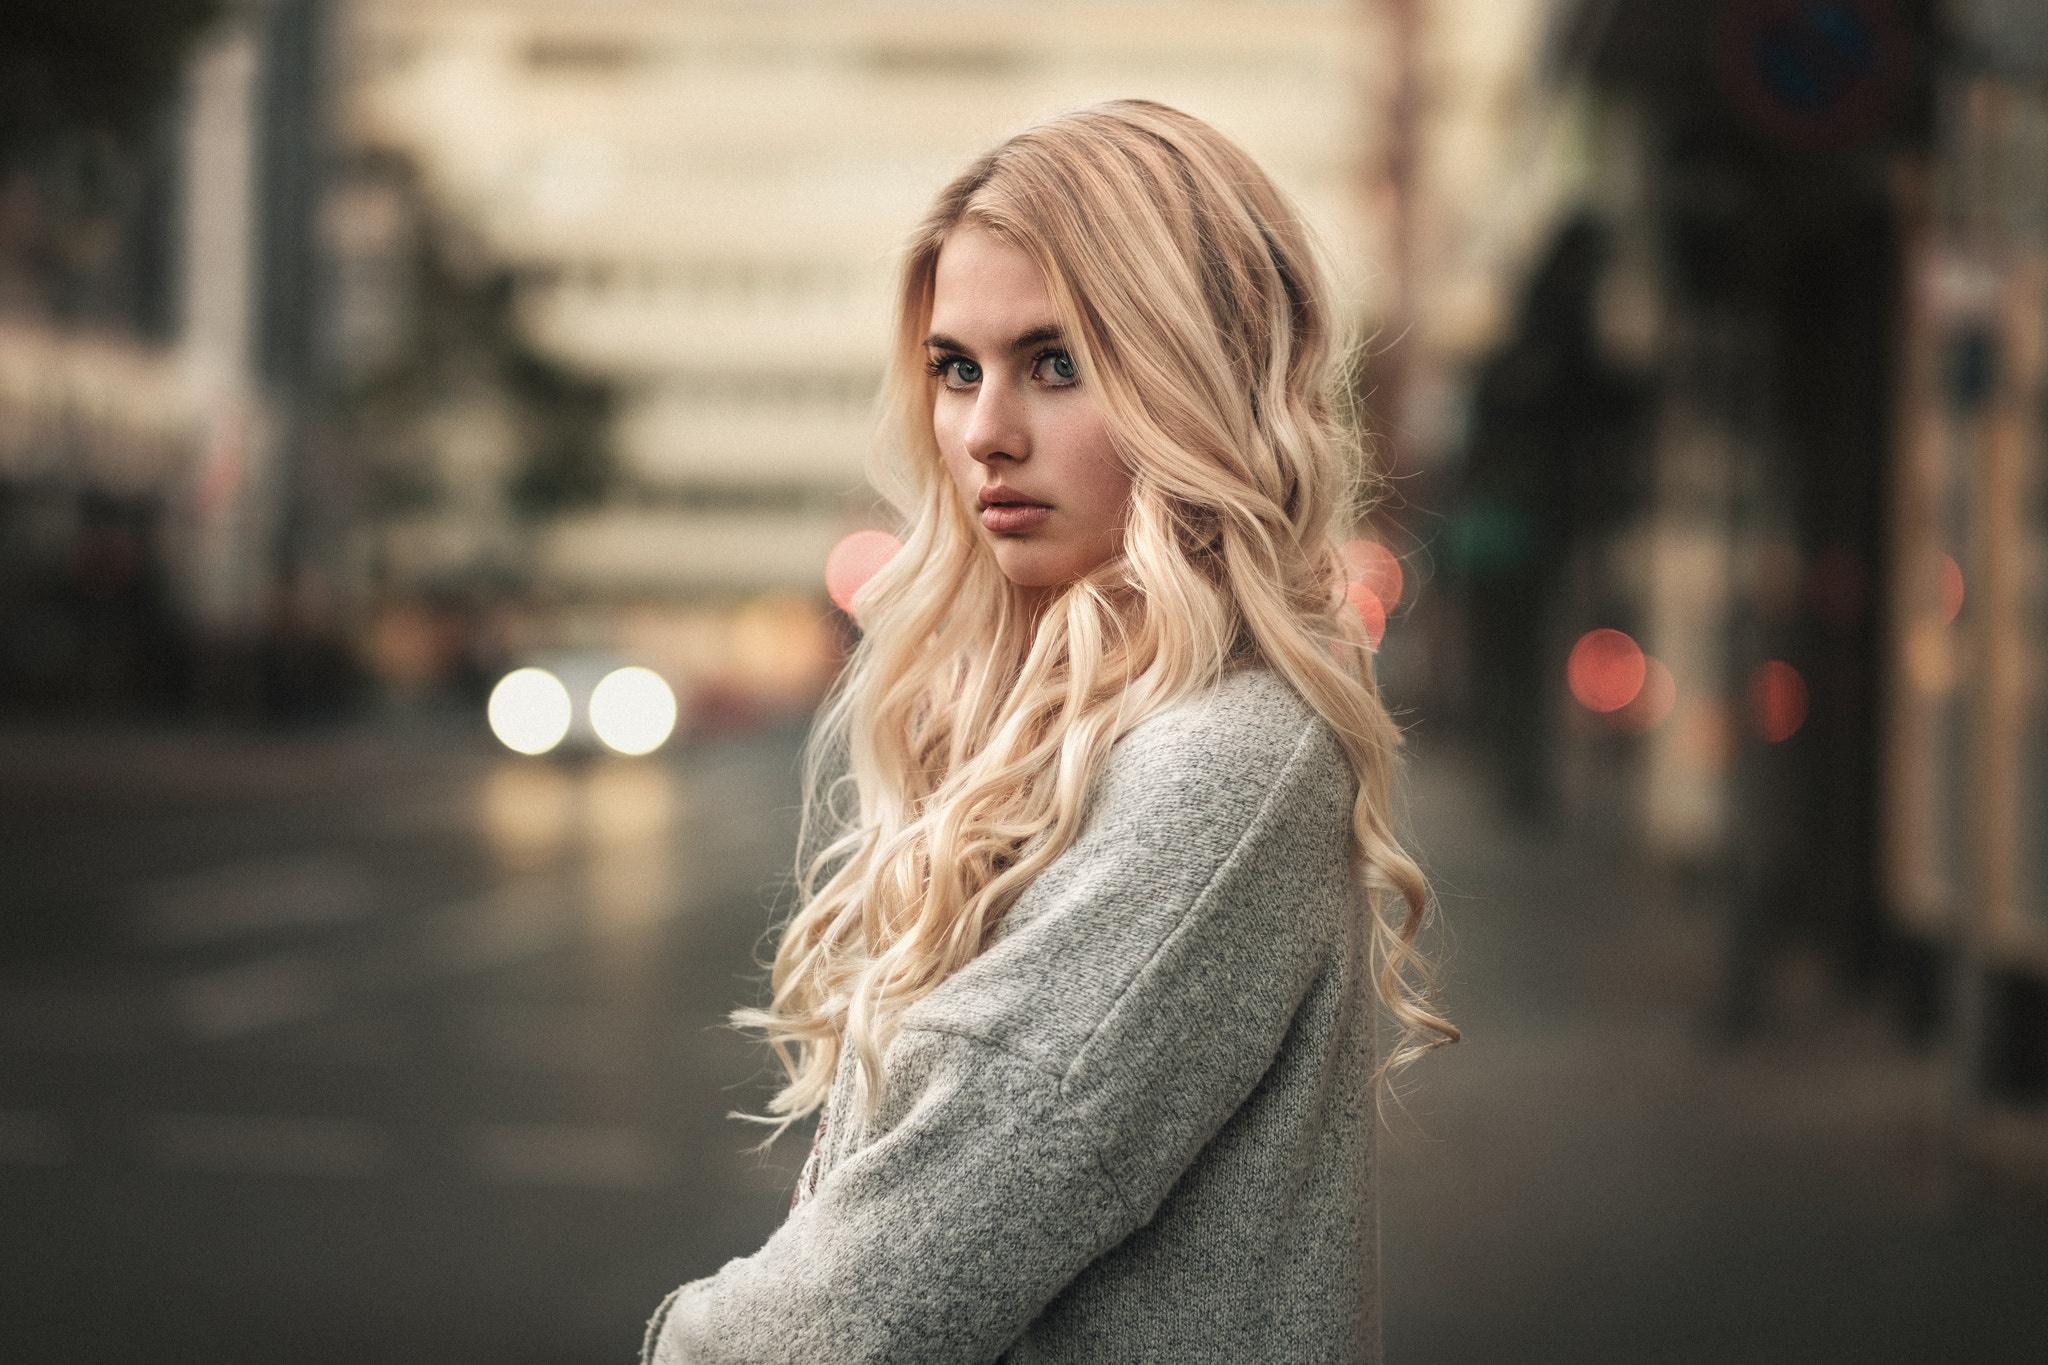 Blond girl year amateur creampie